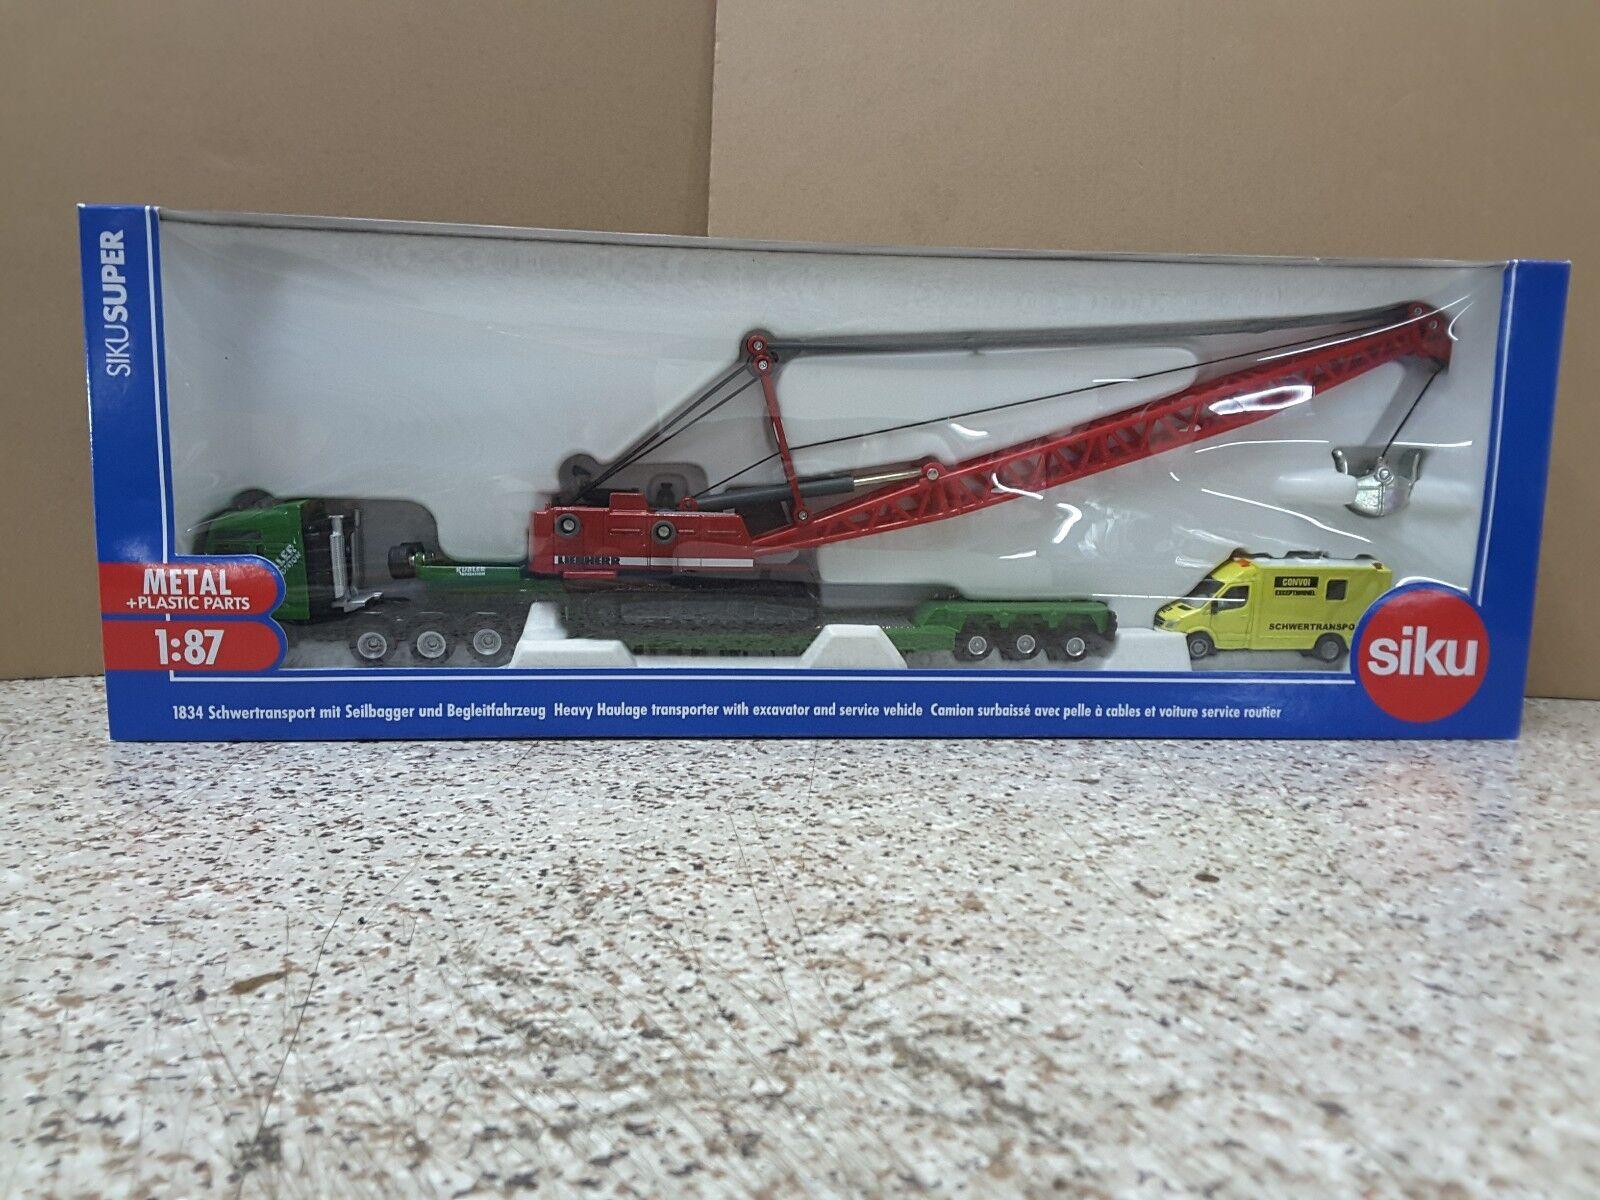 SIKU  1834 1 87 die cast Havery  Transport Transporteur Avec Pelle & Service véhicule  sortie d'usine